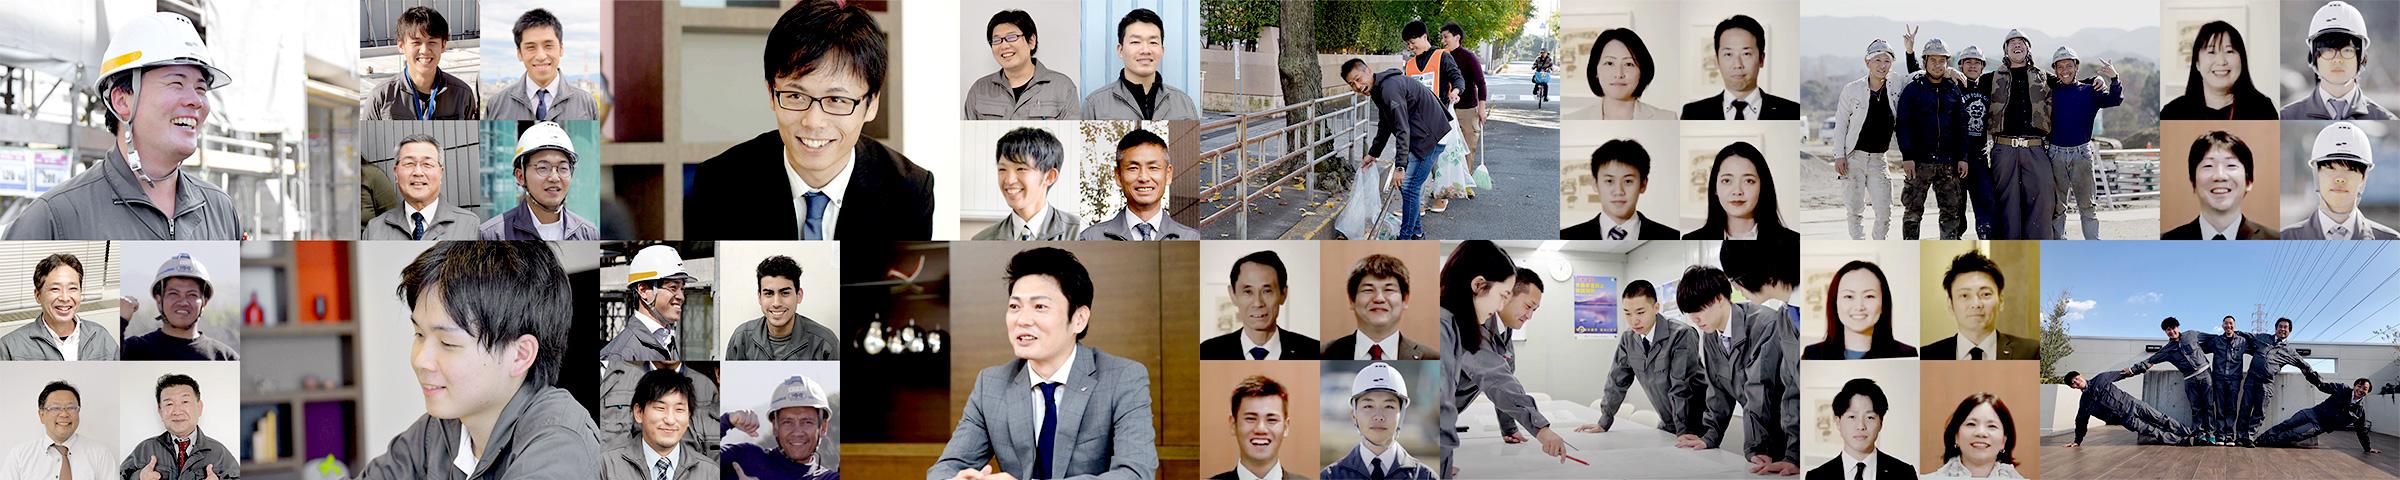 花谷建設株式会社イメージ